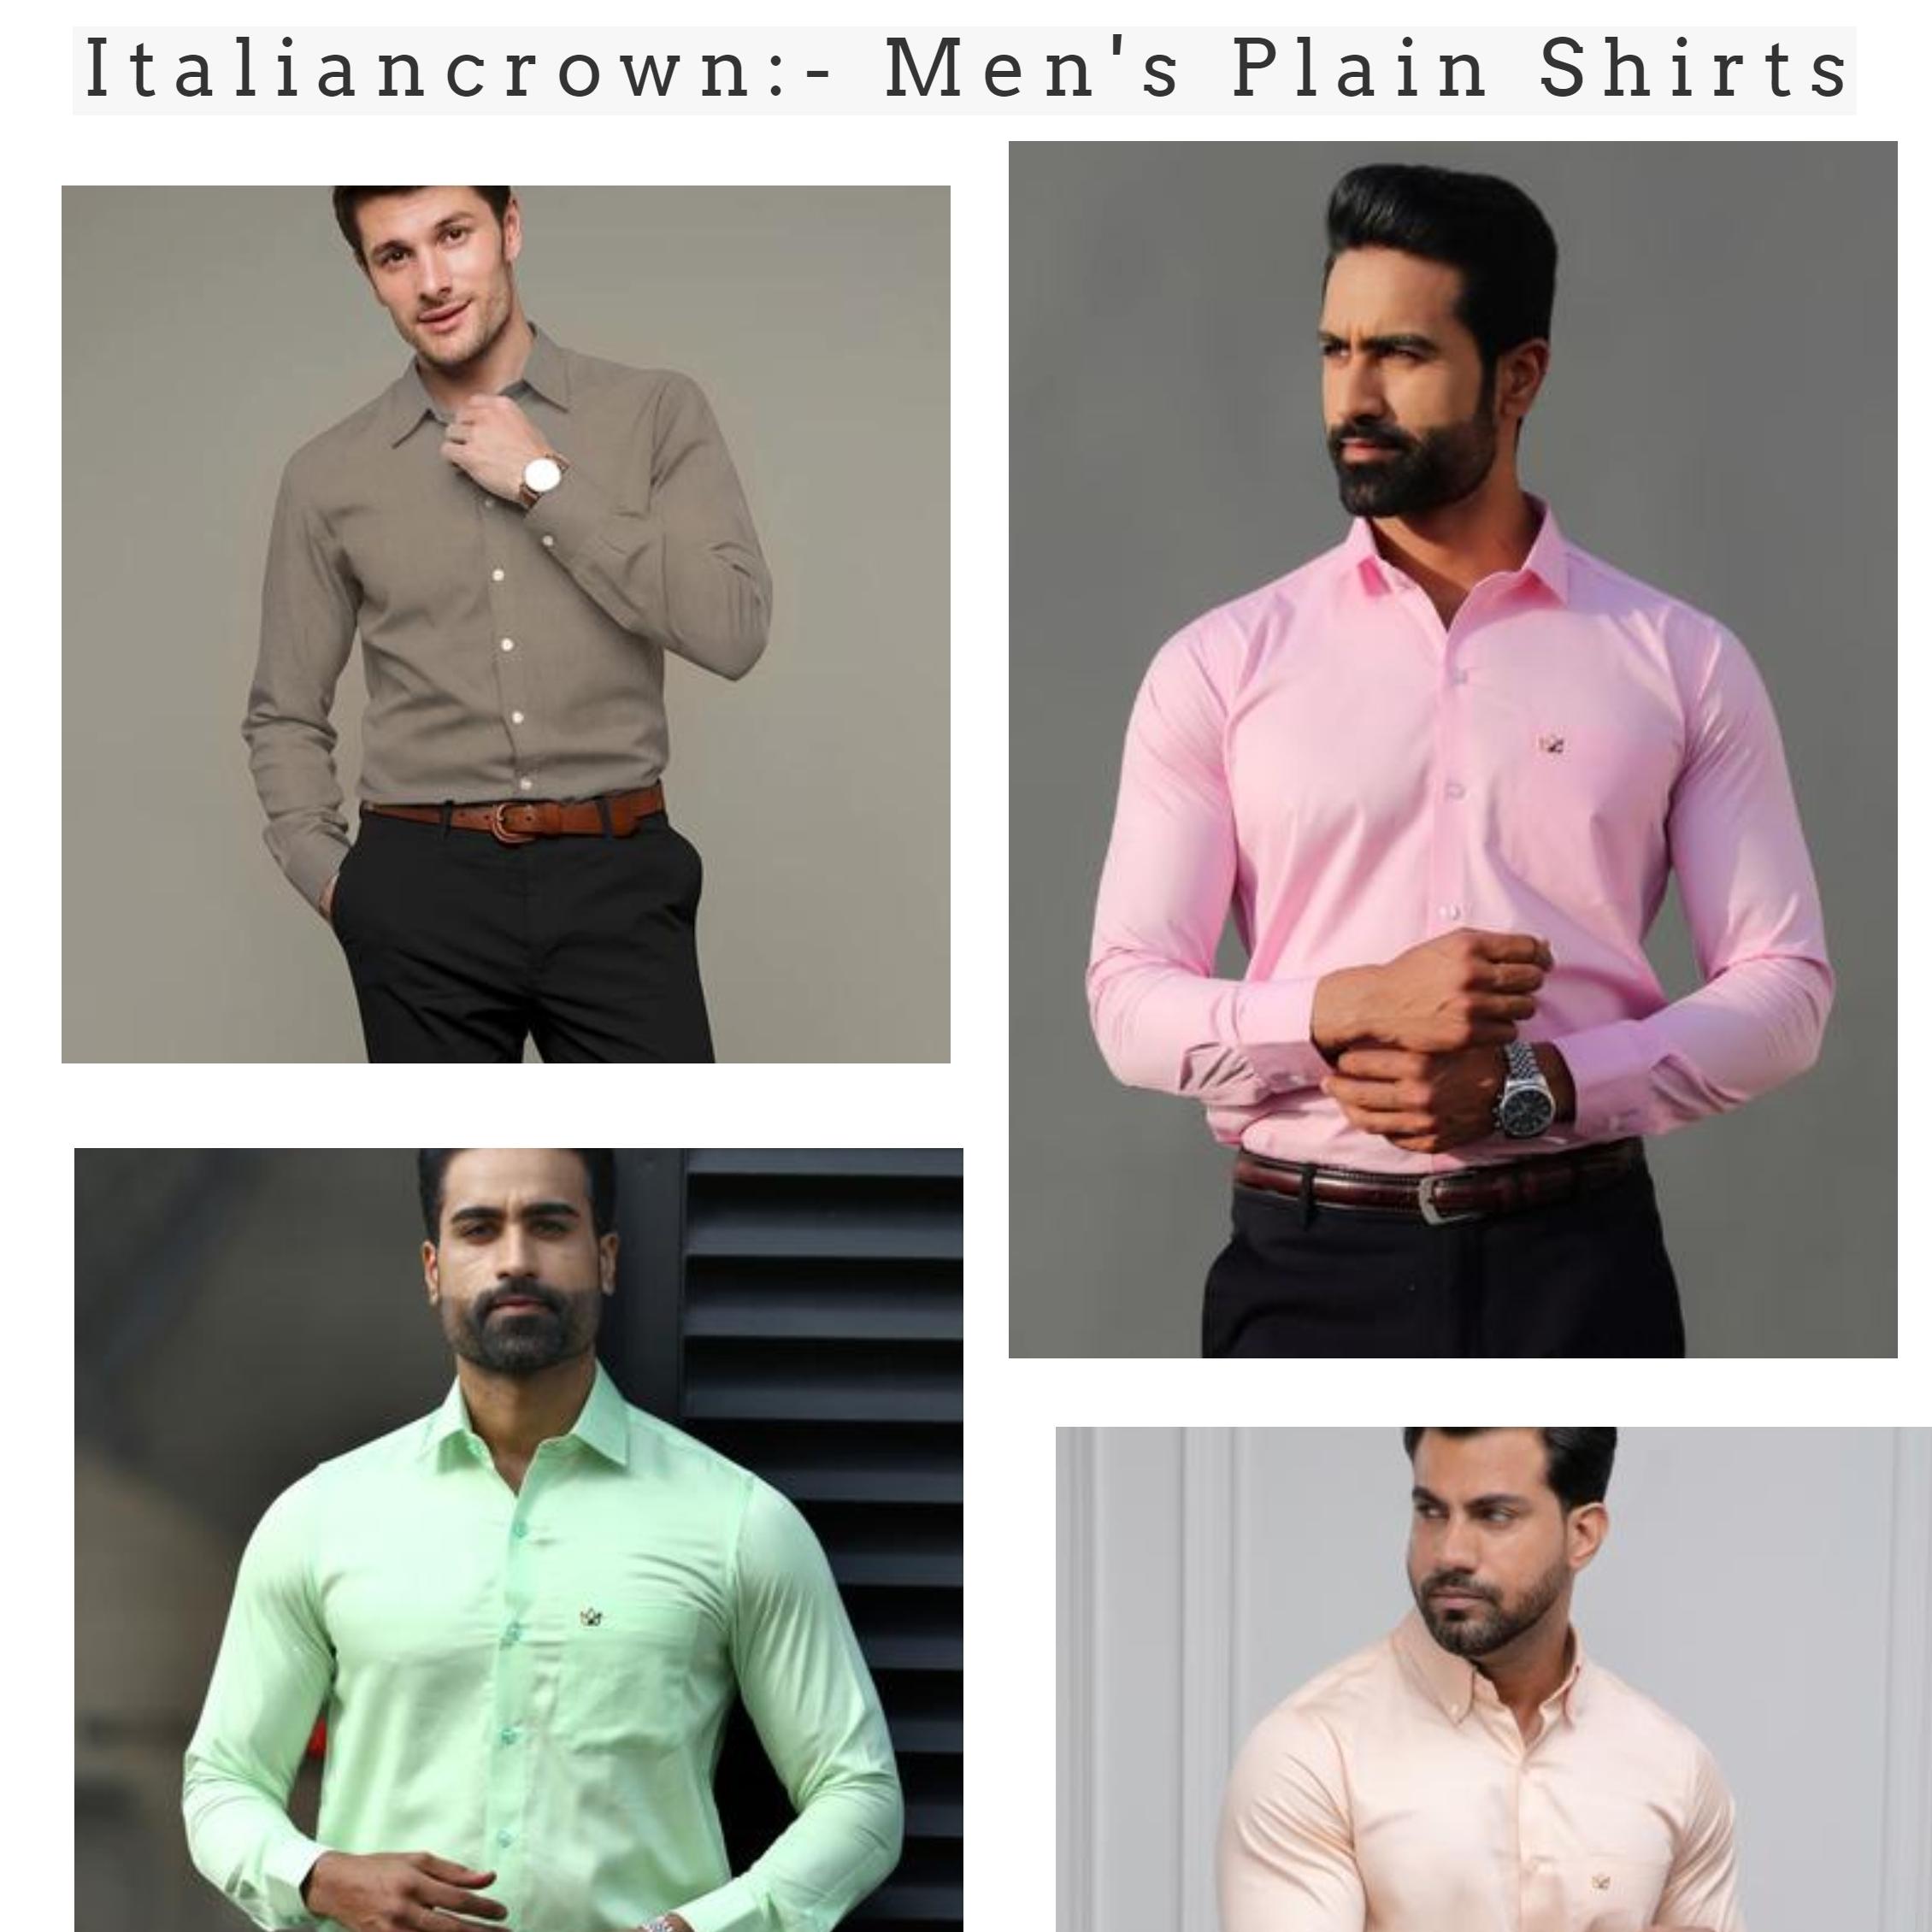 Italiancrown Plainshirt